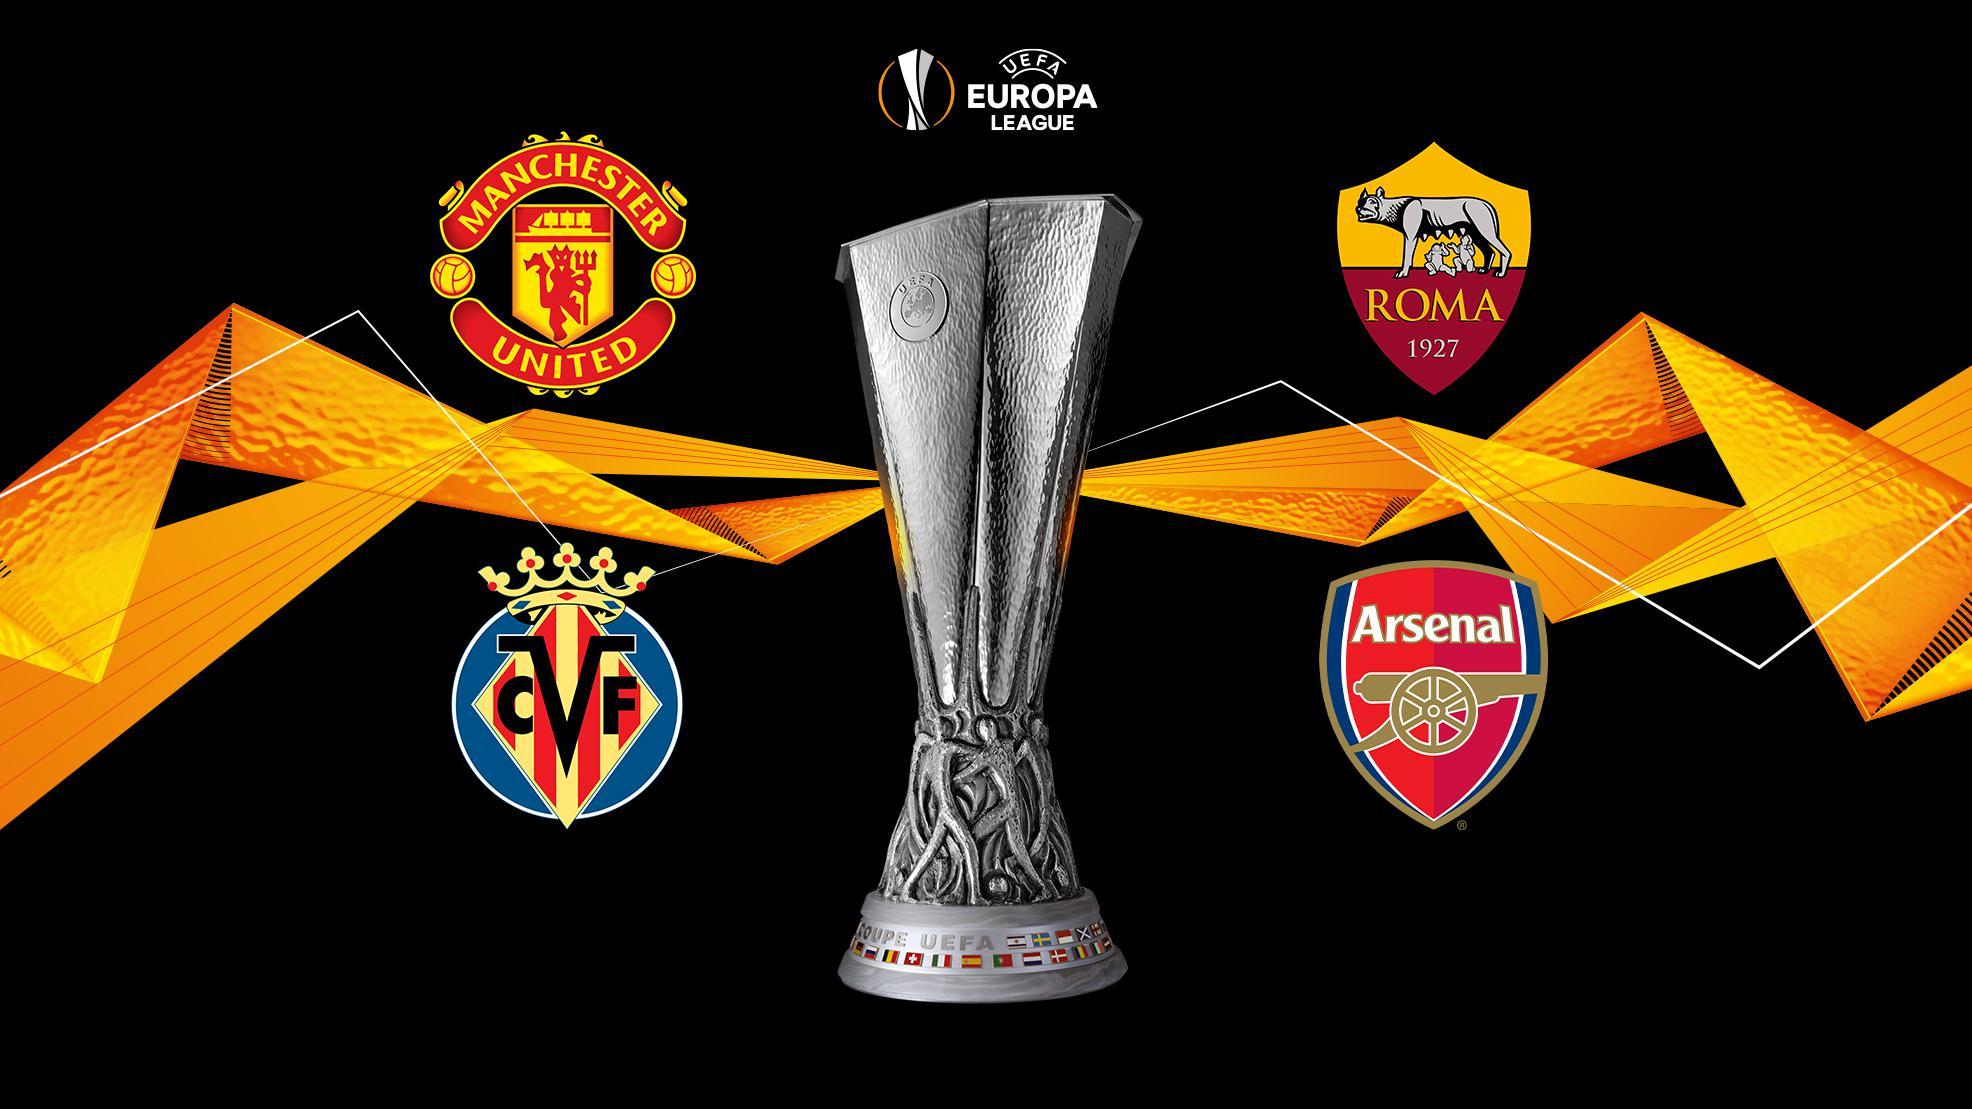 UEFA EUROPA league 2021 semi finals